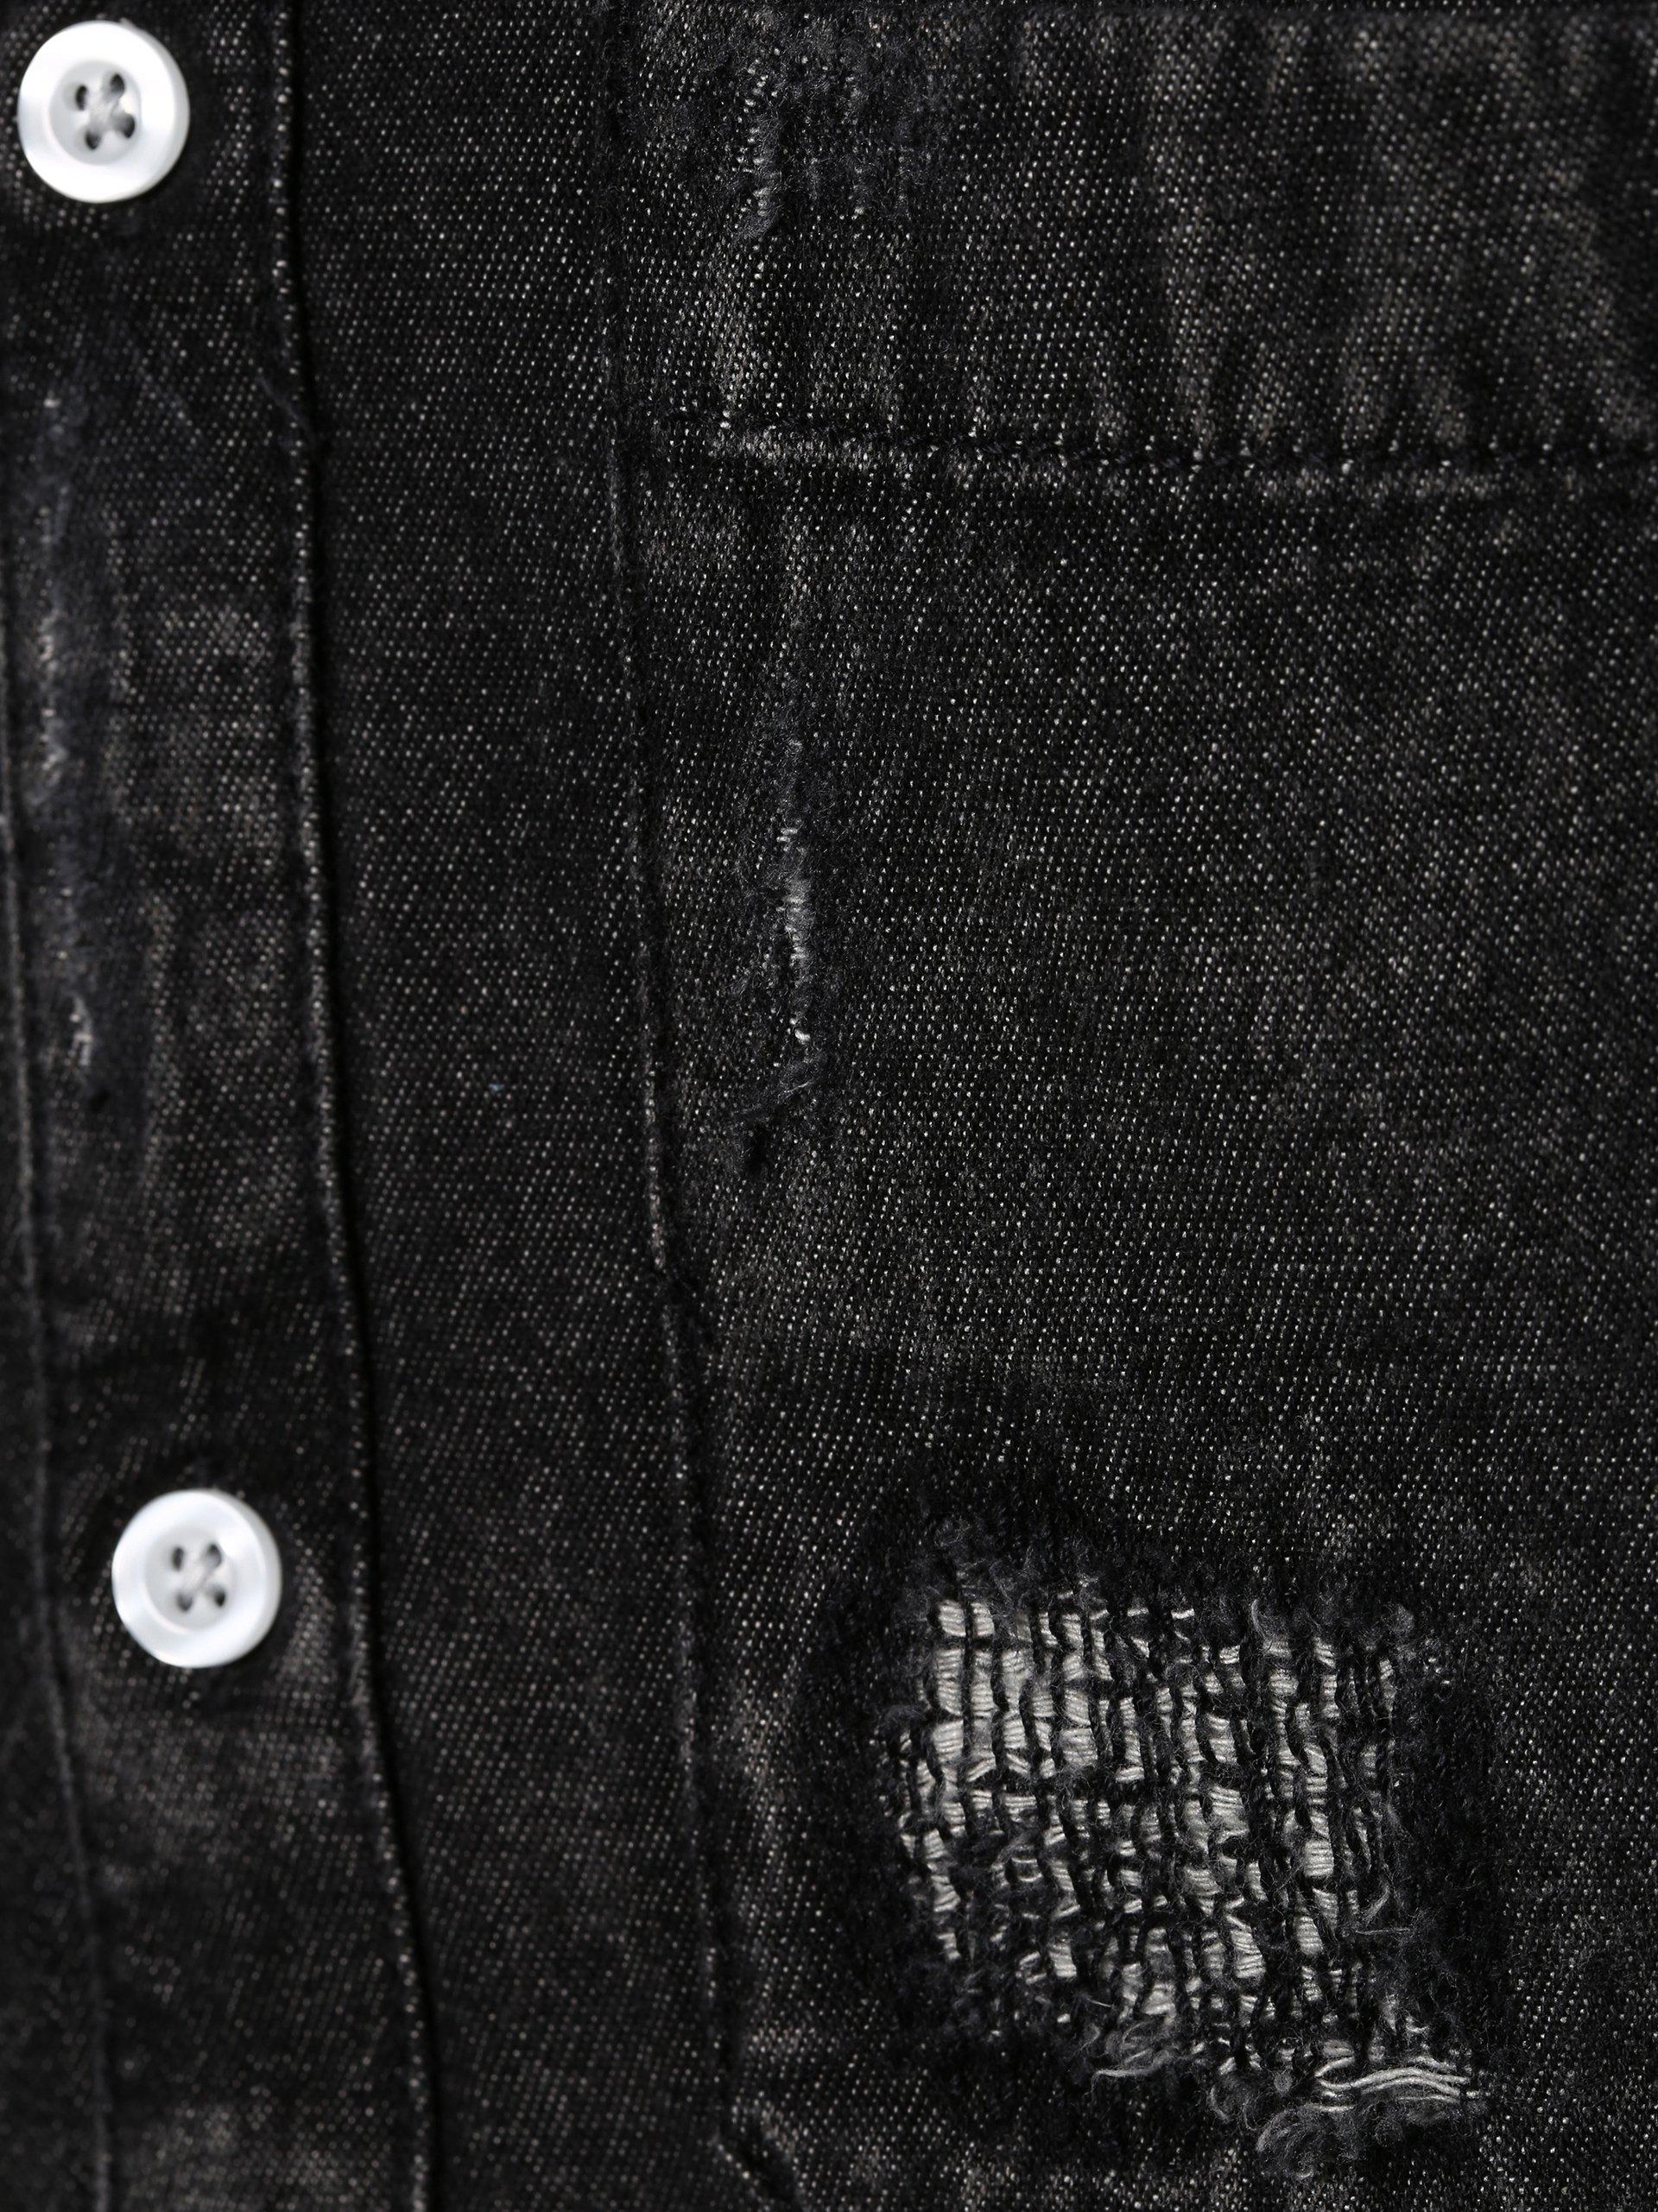 review herren jeanshemd schwarz uni online kaufen peek. Black Bedroom Furniture Sets. Home Design Ideas